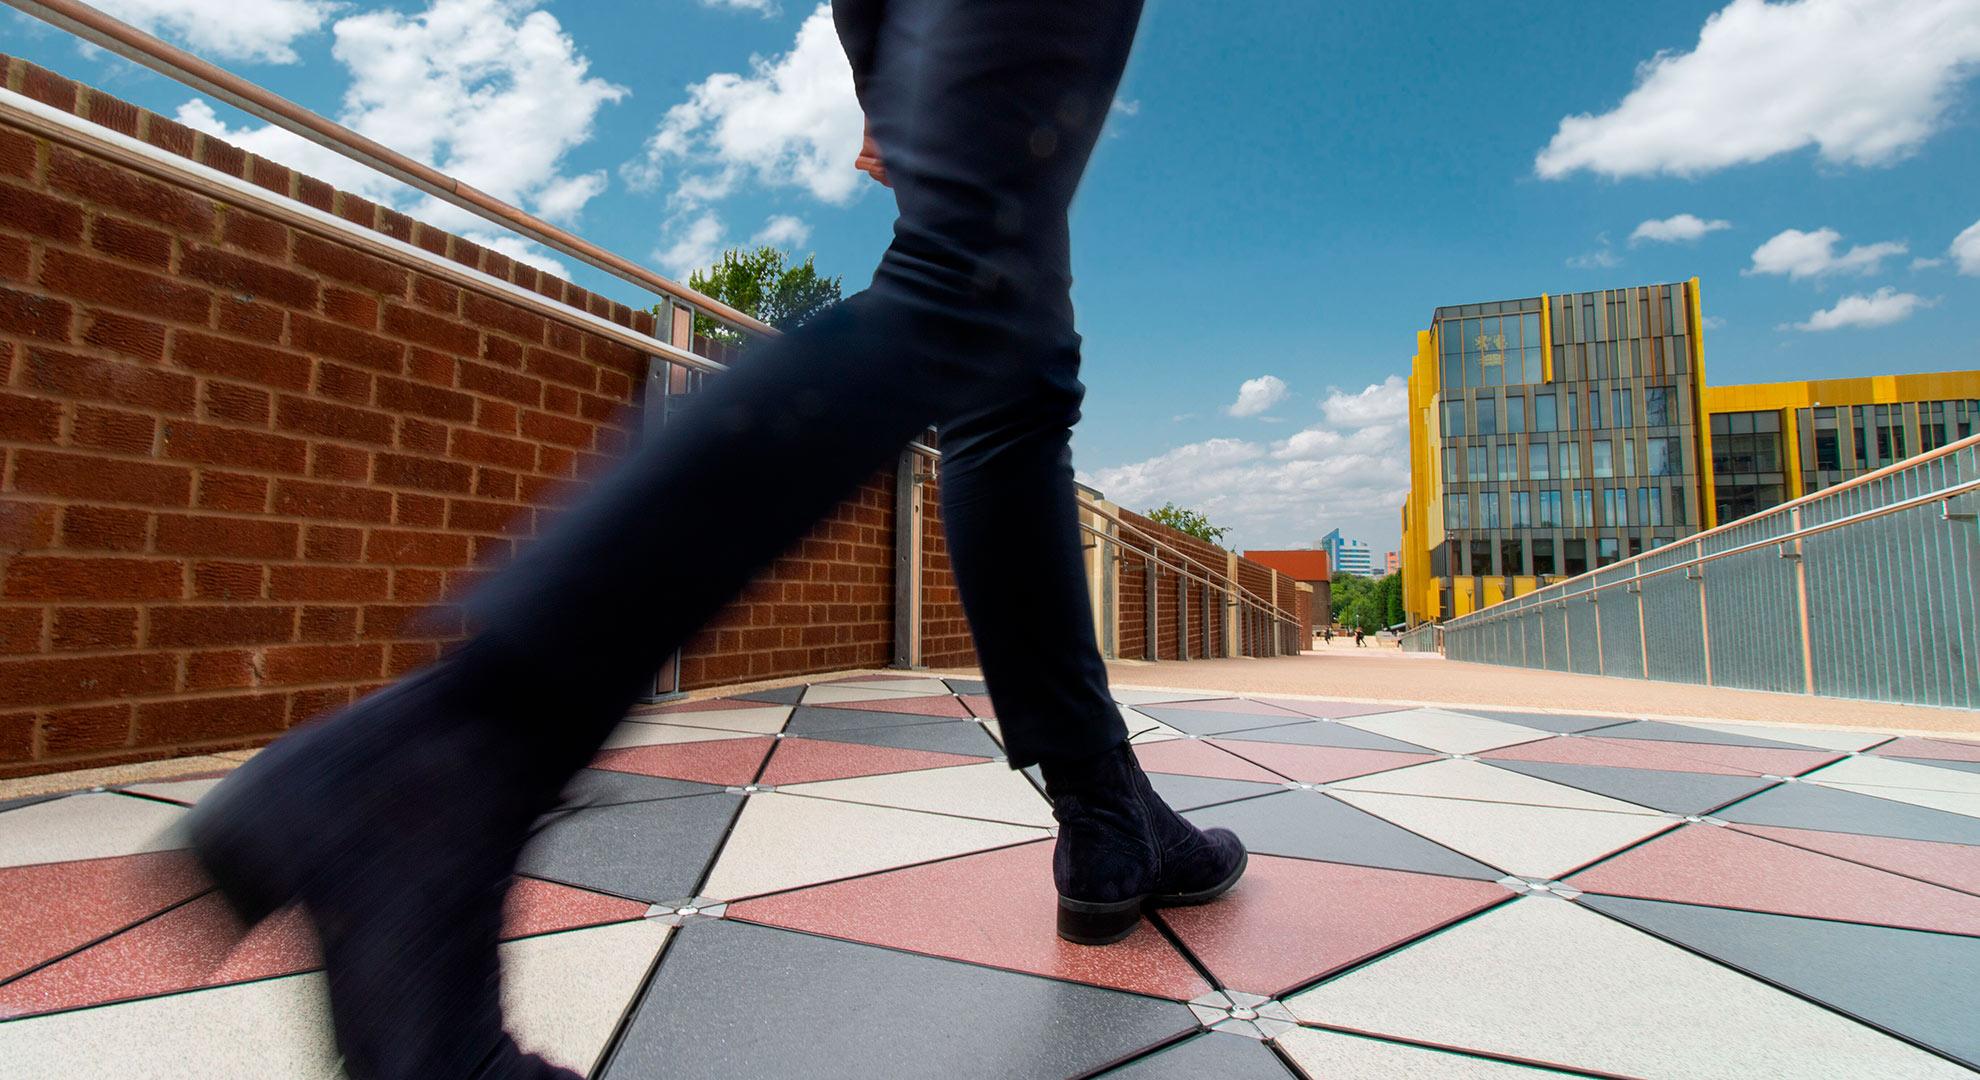 Pavegen tiles in an urban city setting.